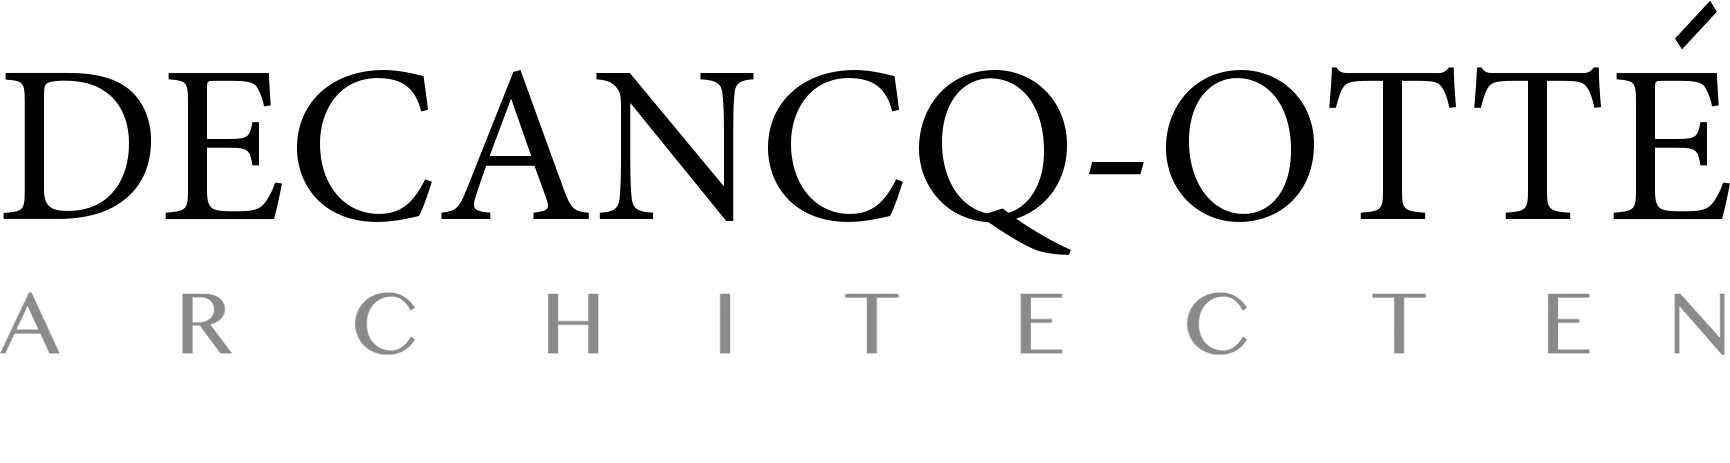 Logo Decancq-Otté Architecten